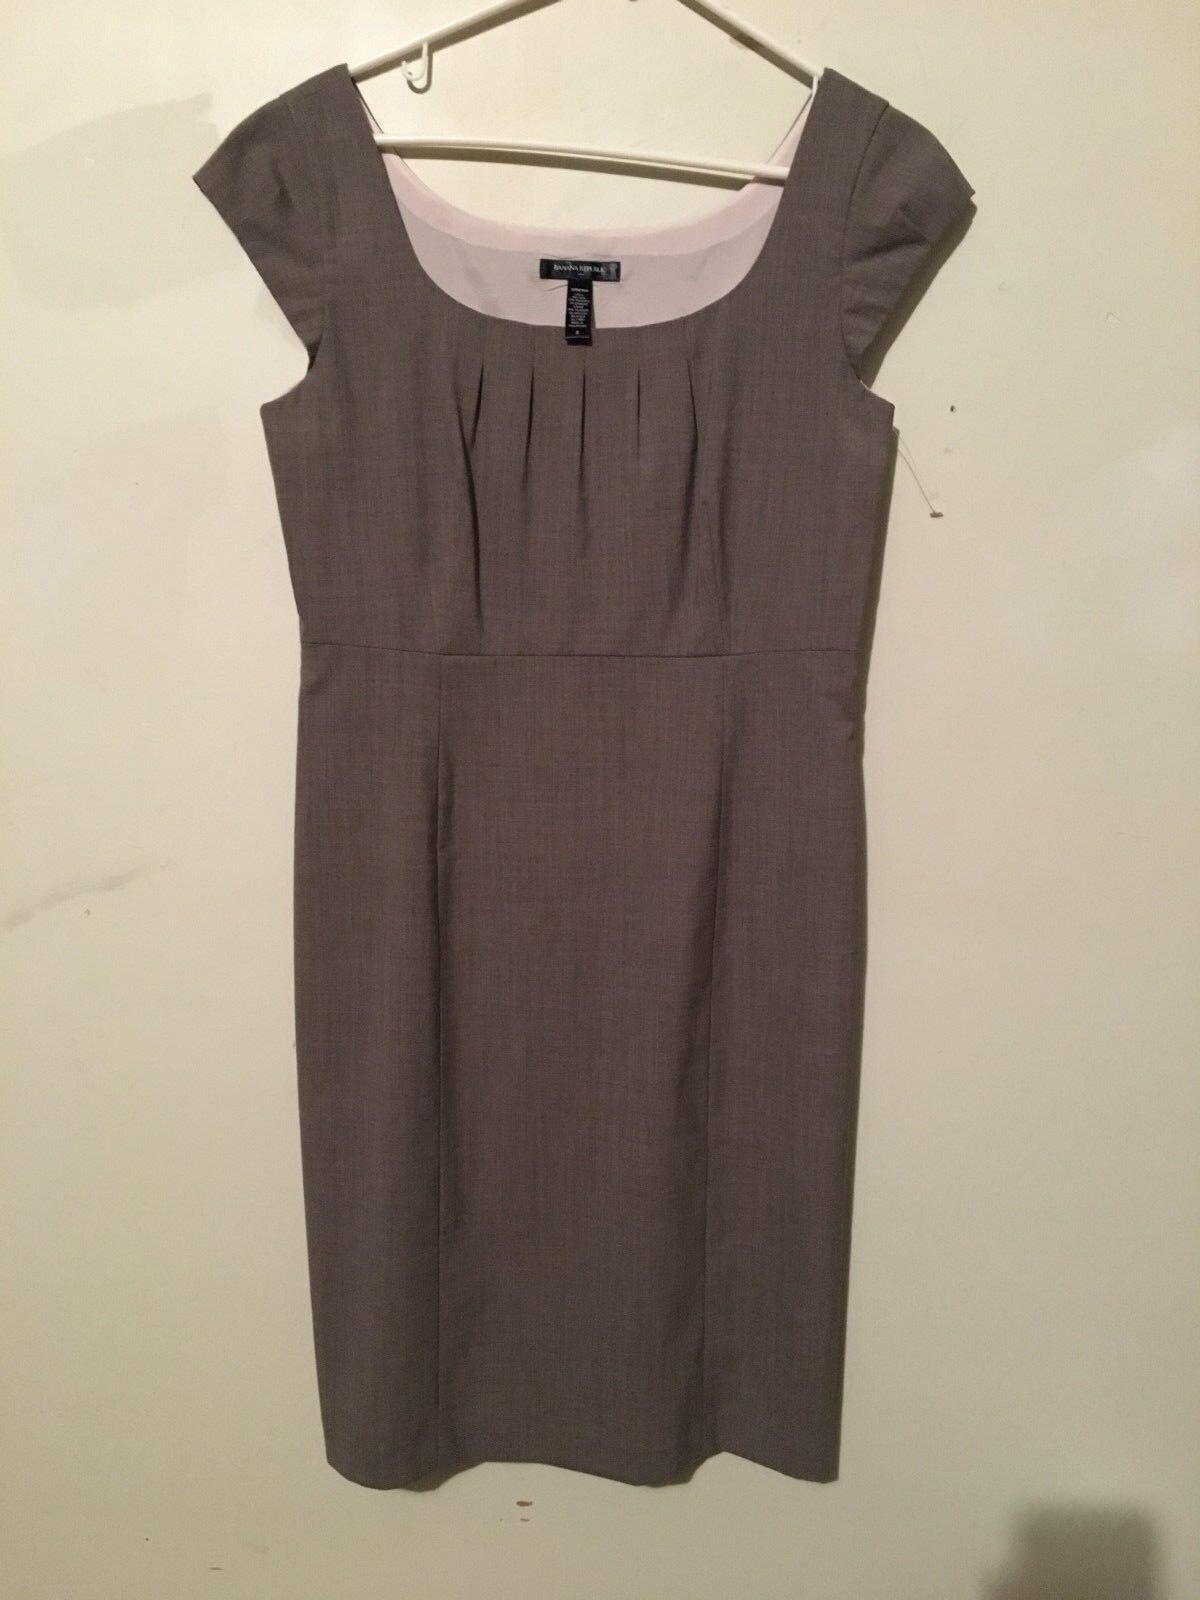 Banana Republic Light braun Cap Sleeve Boat Neck Dress damen Größe 8 Formal